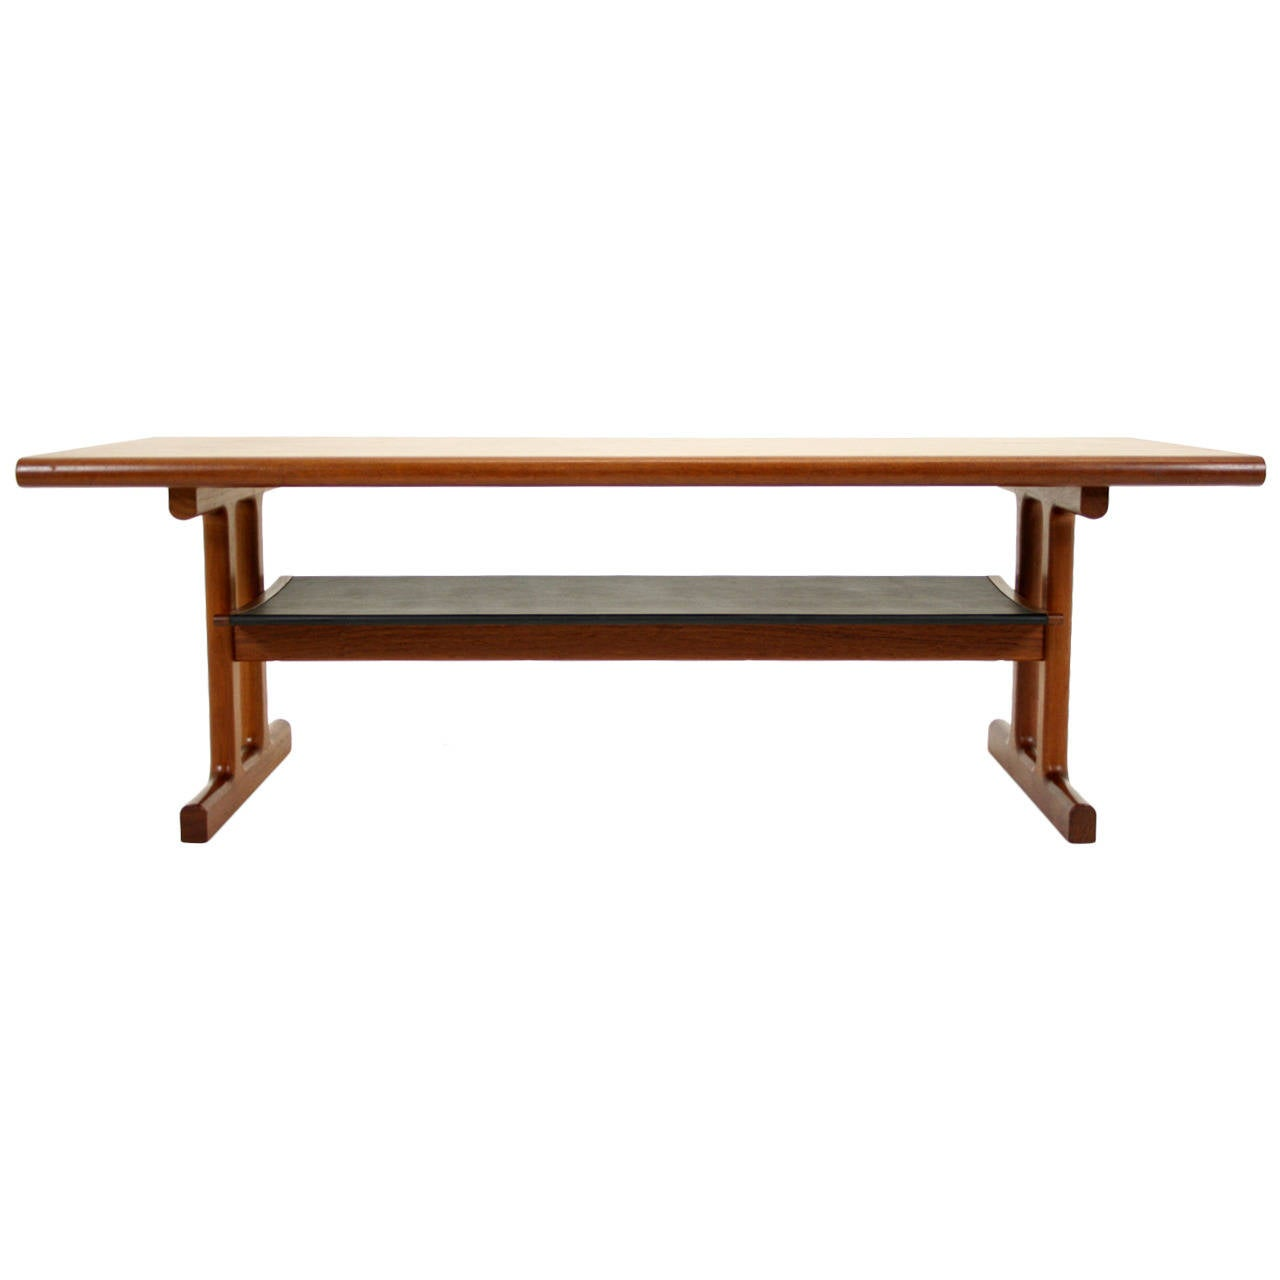 Danish Mid Century Modern Teak Coffee Table With Shelf By C F Christensen At 1stdibs